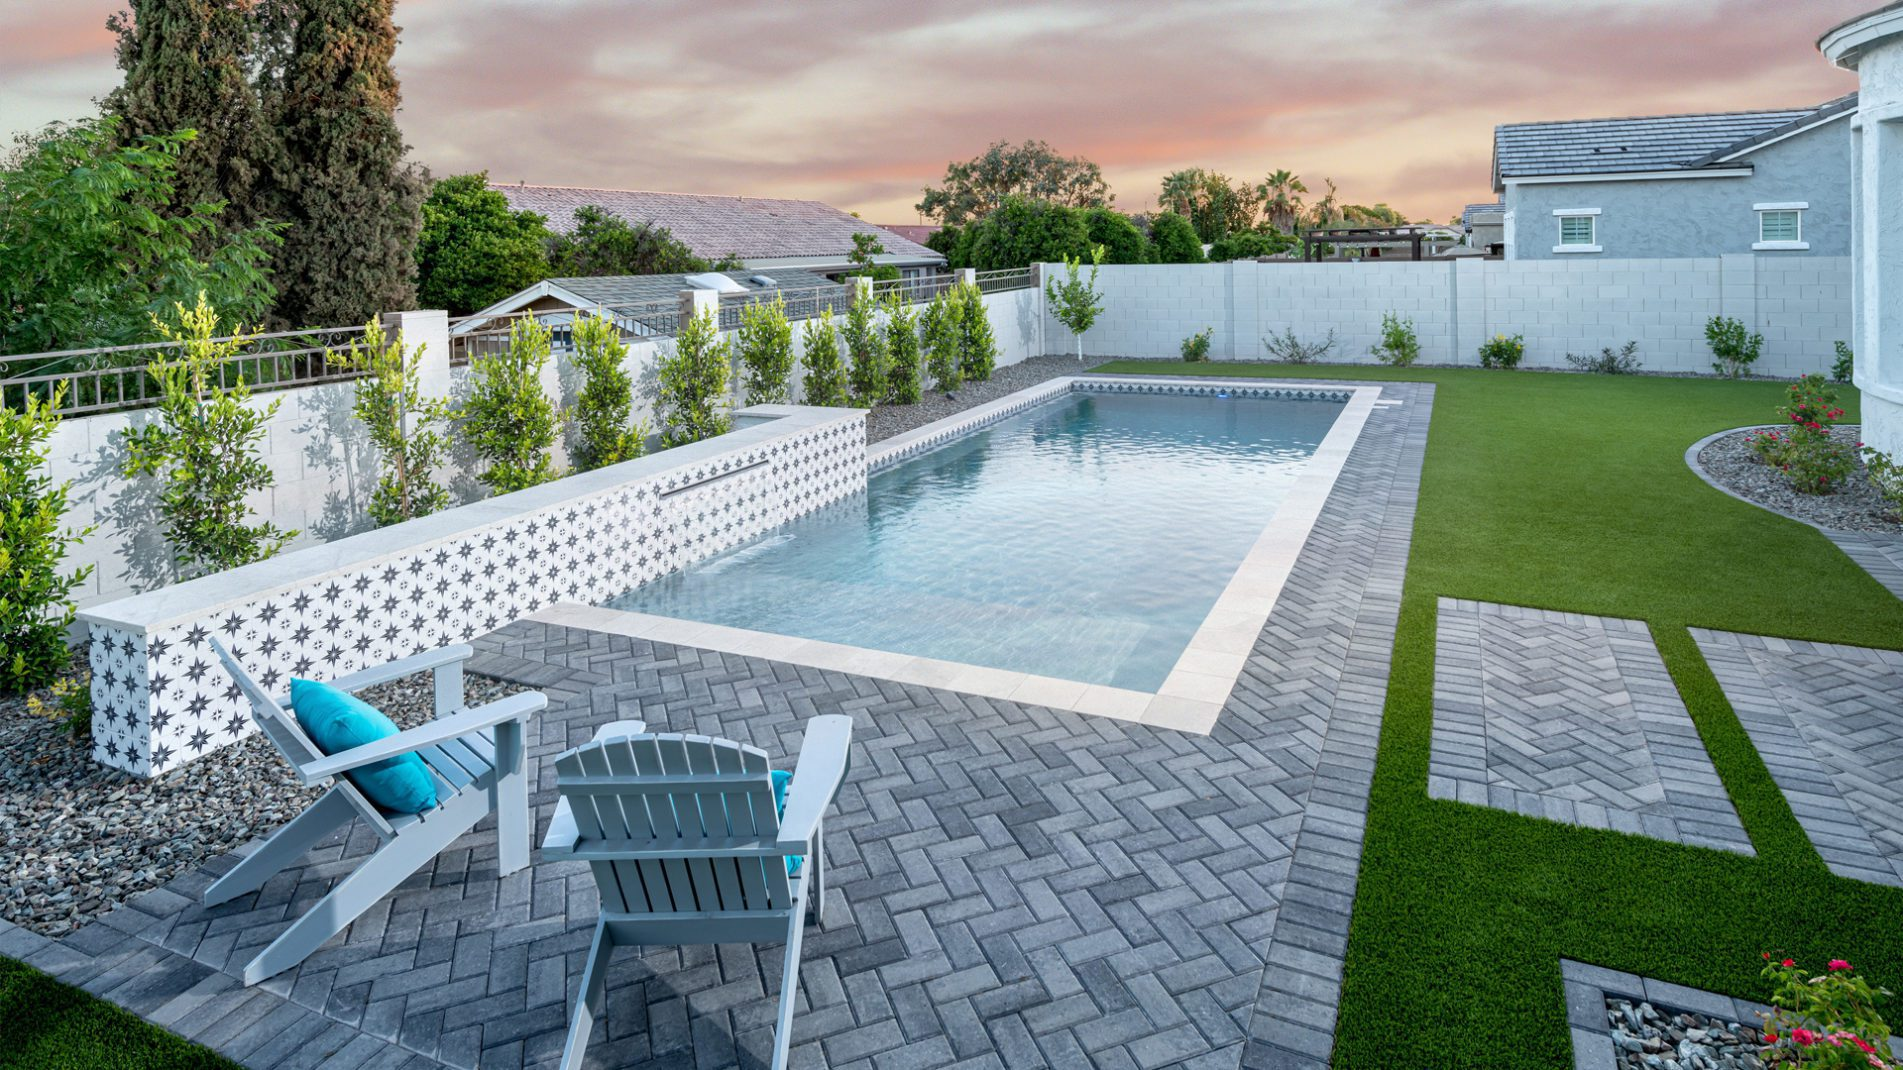 Pool Point Of View - Starburst Monochrome Full Backyard